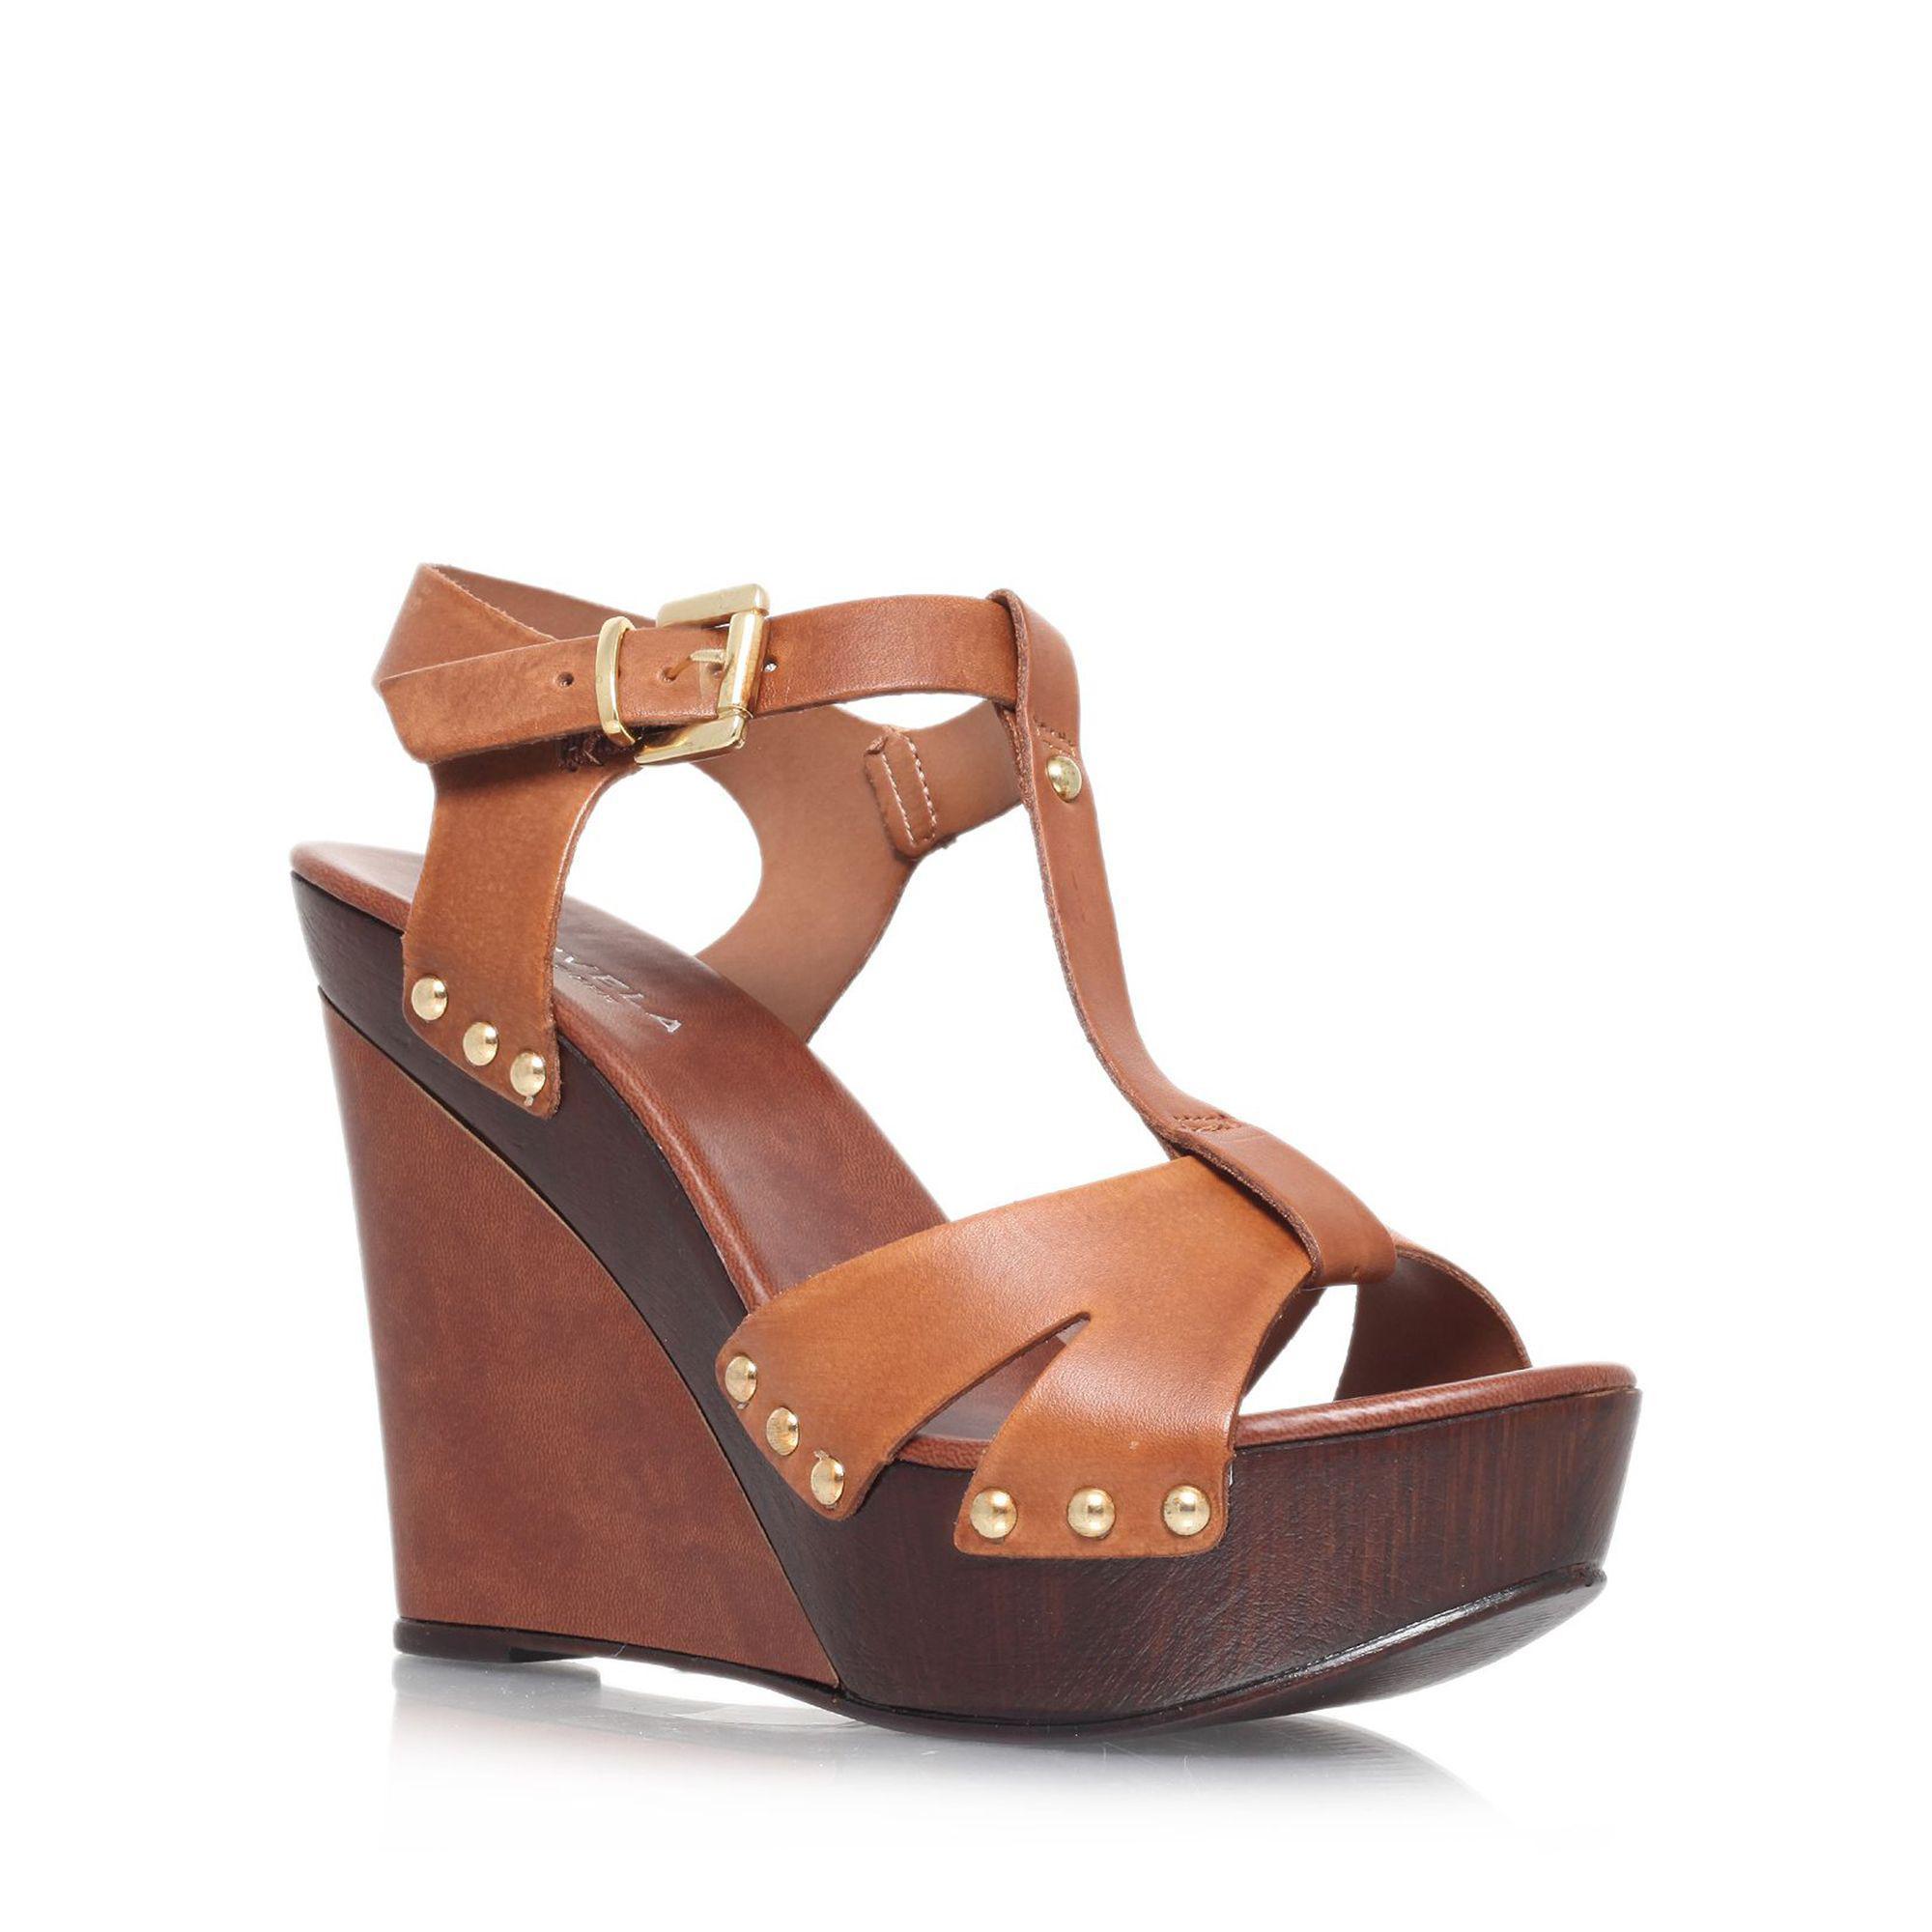 Carvela Klaus - tan high heel wedge sandals Outlet In China Free Shipping Eastbay Sast Online Nice Buy Cheap Best Seller svSSR7SIVt